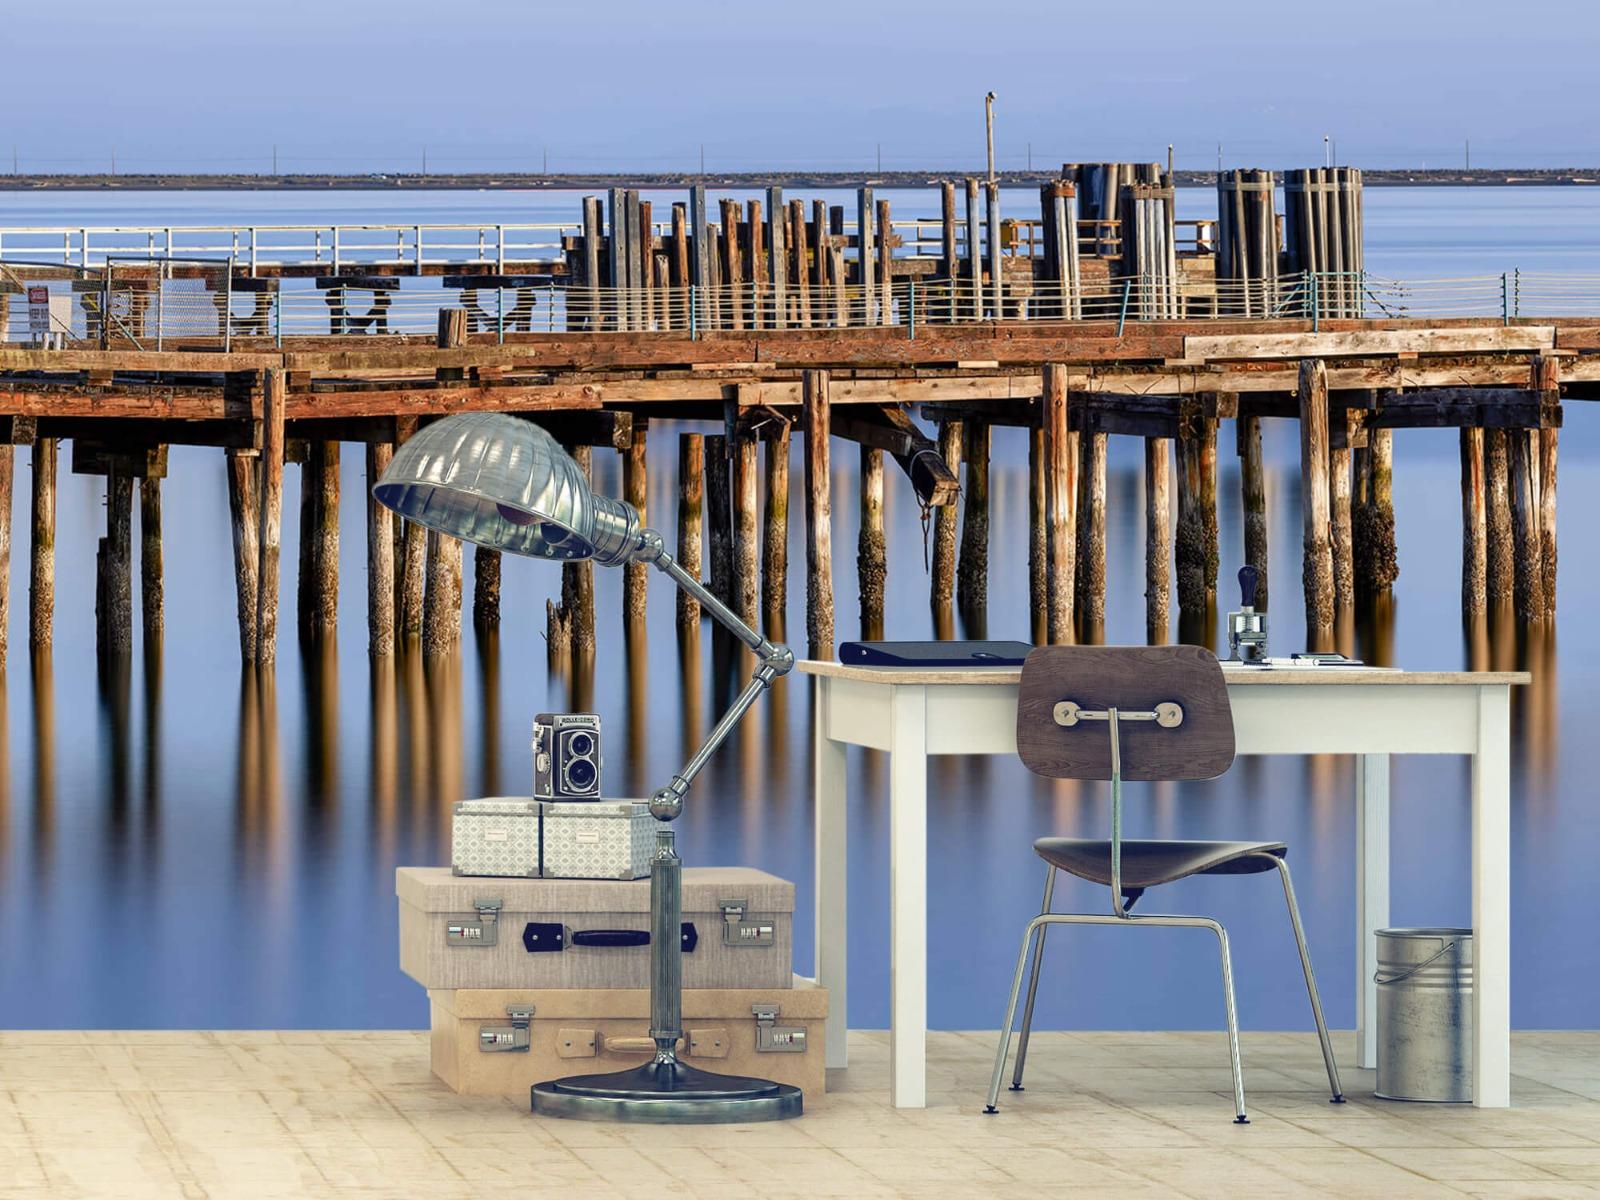 Houten Steigers - Steiger op houten palen - Wallexclusive - Slaapkamer 10